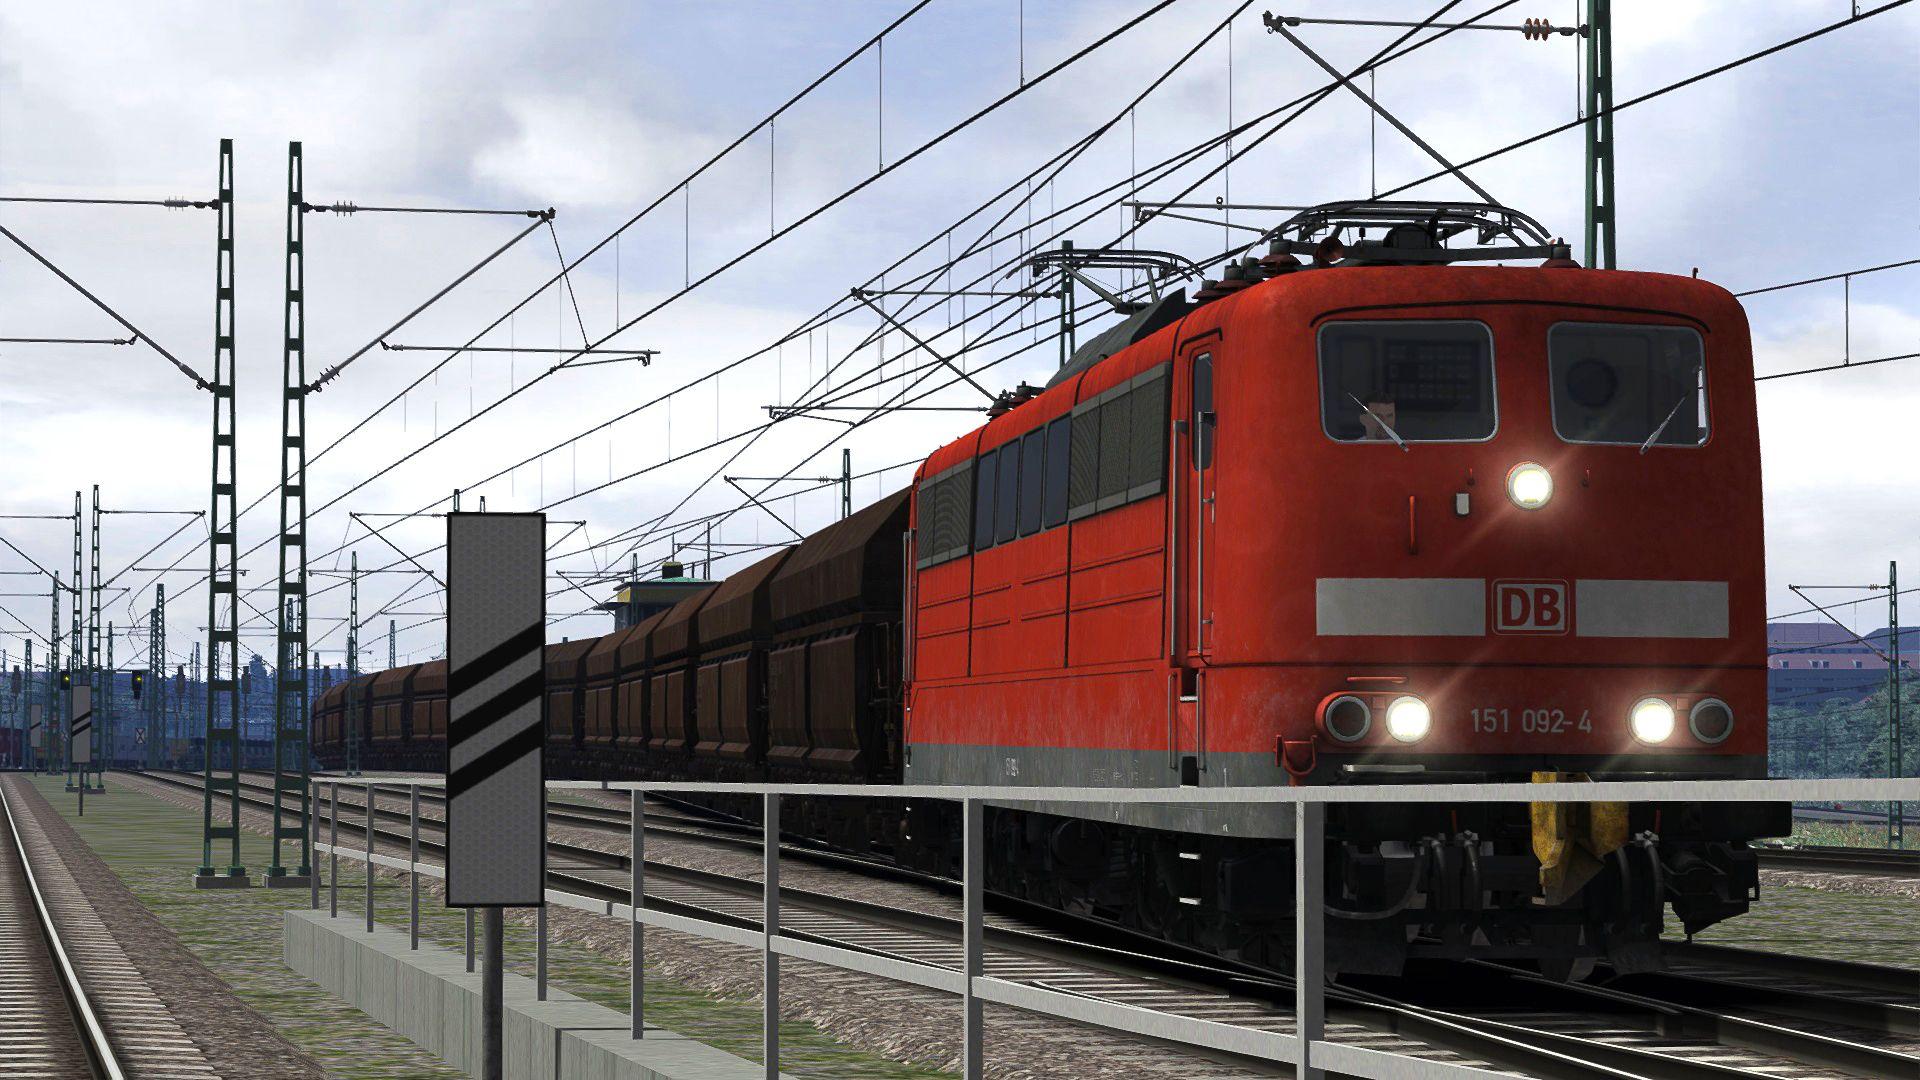 DB1514